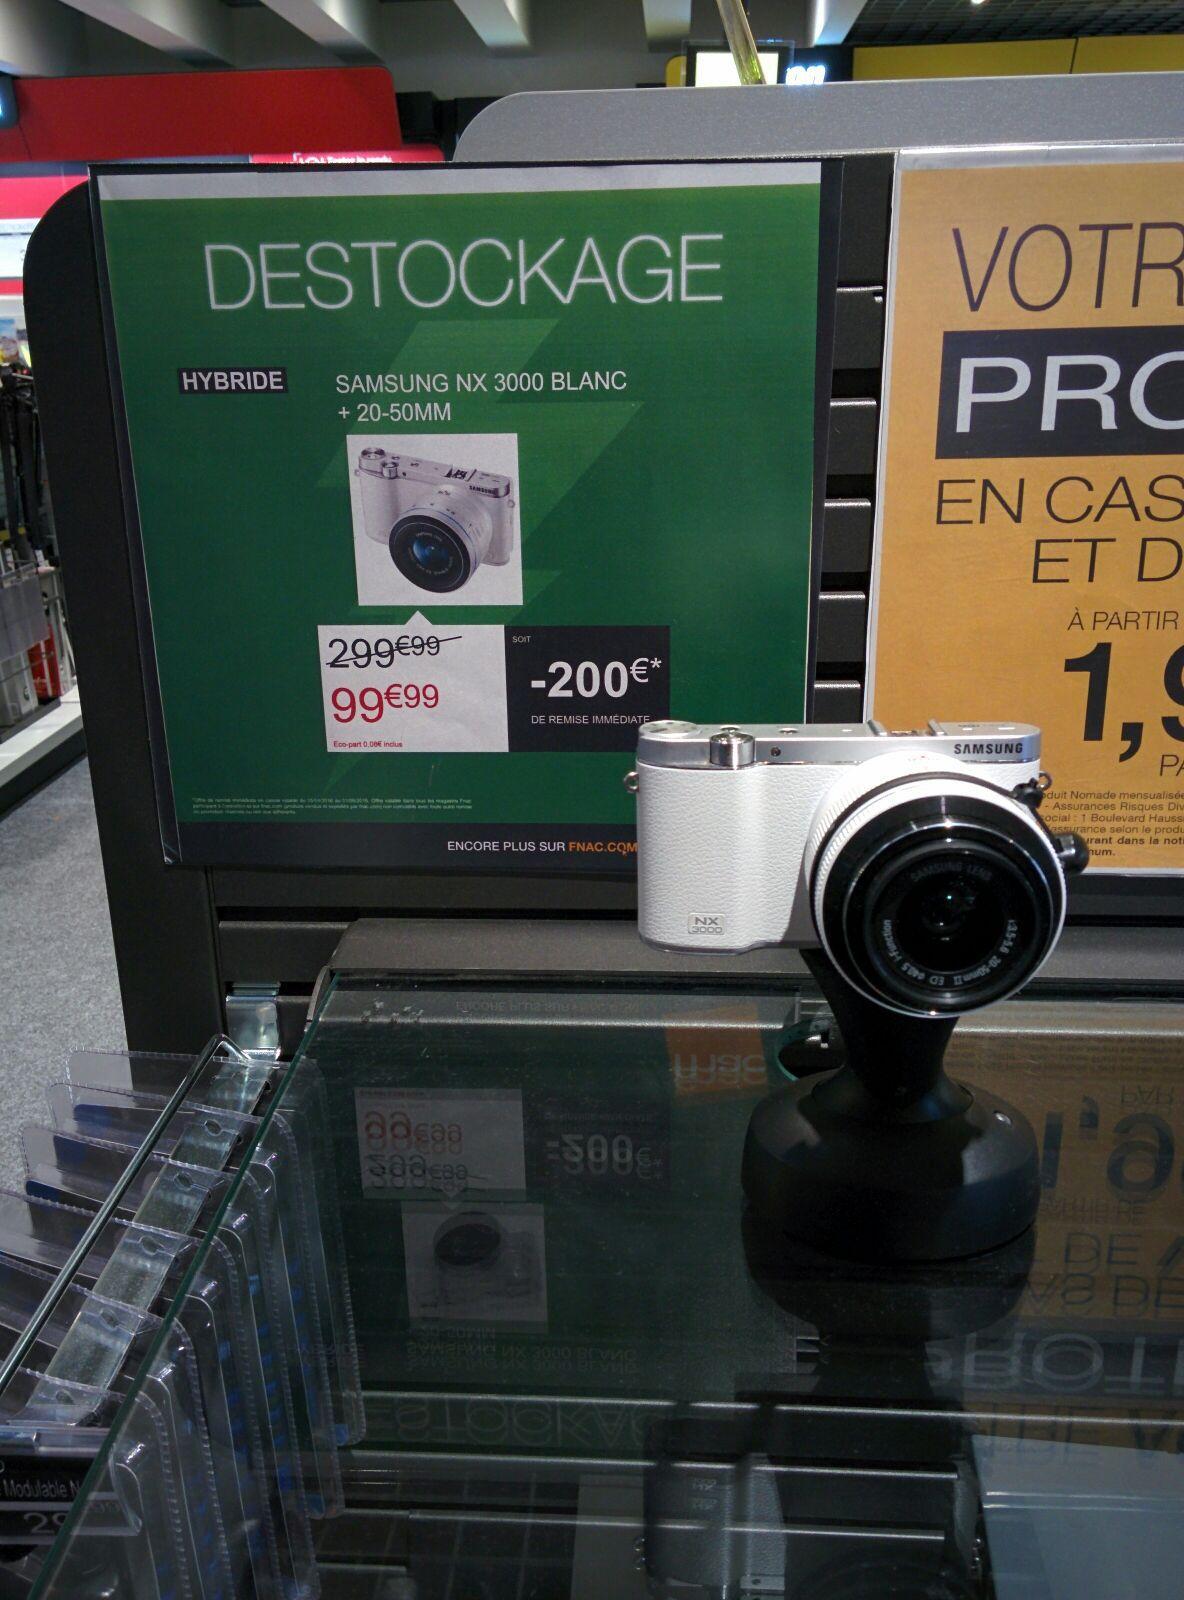 Appareil photo Samsung NX 3000 Blanc + Objectif 20-50mm